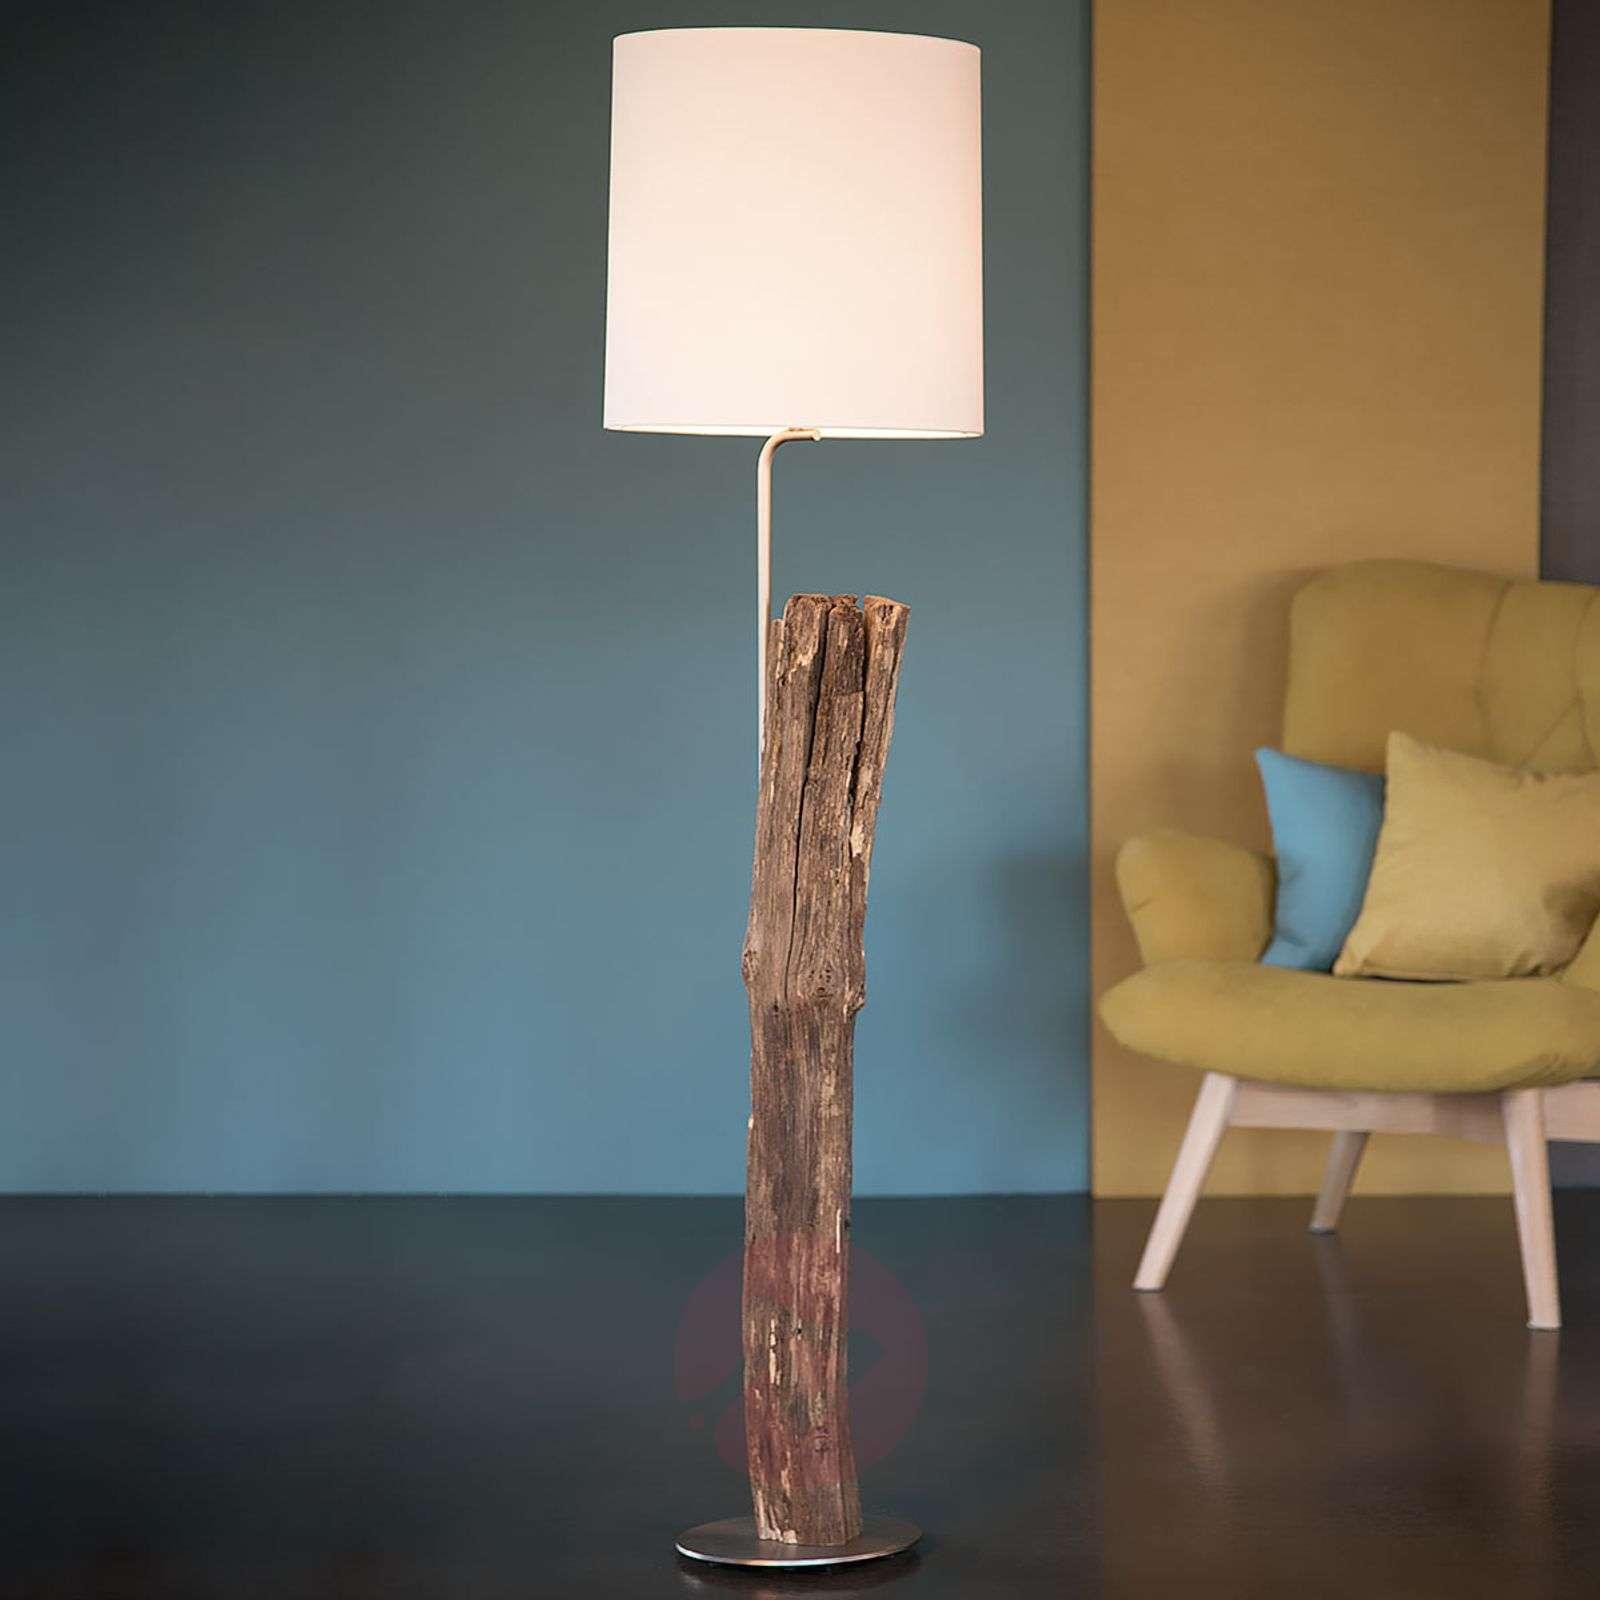 alter lighting. Alter Kavalier Wood Floor Lamp With Felt Shade-4543018-01 Lighting